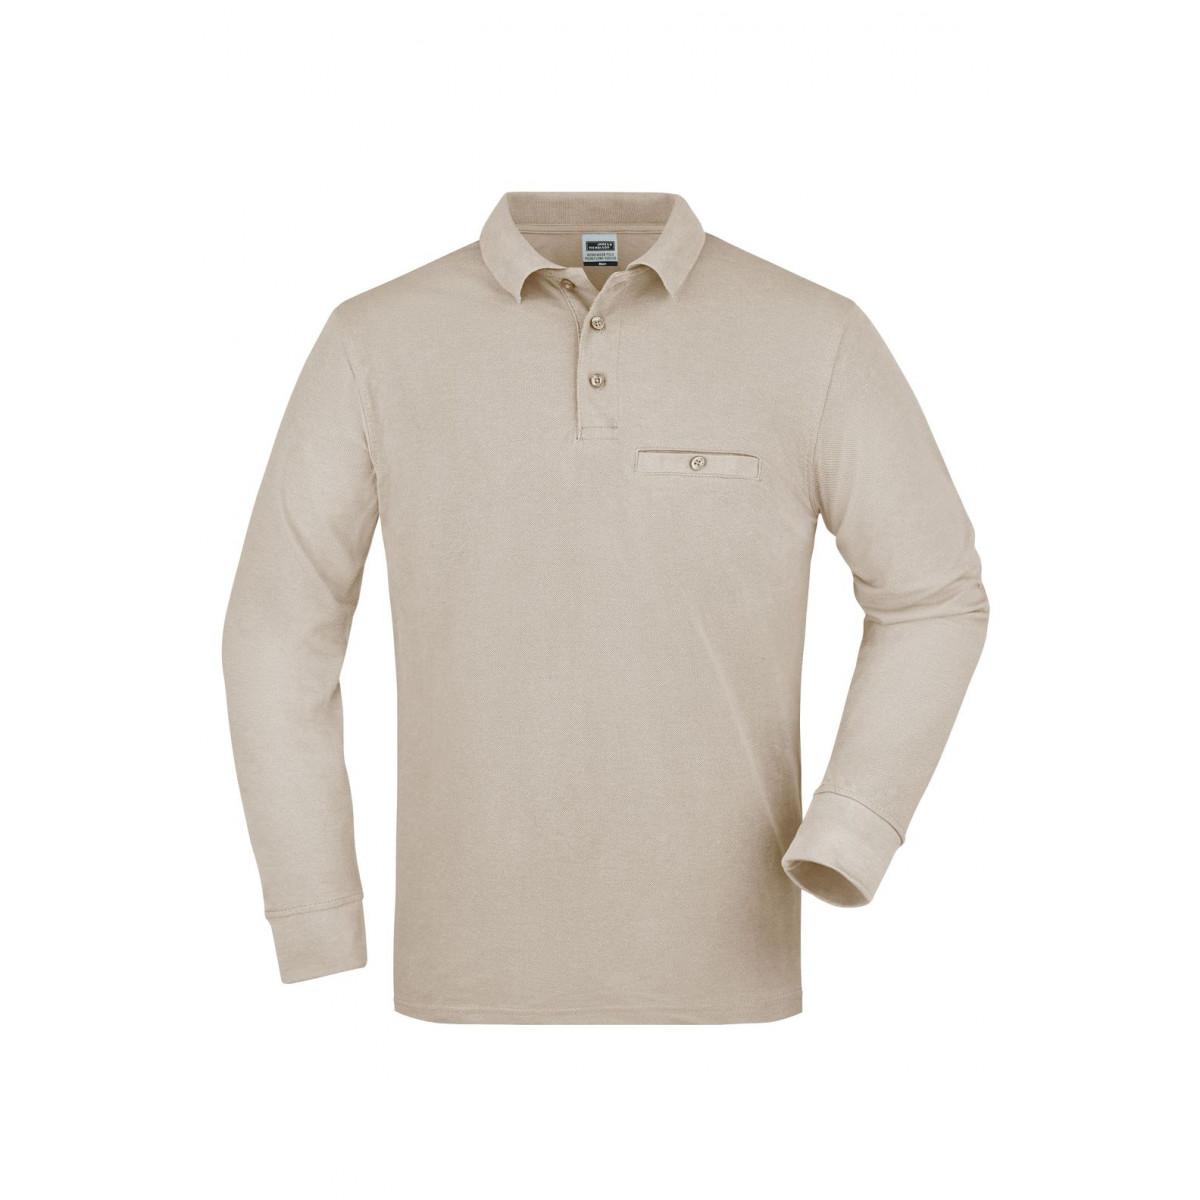 Рубашка поло мужская JN866 Mens Workwear Polo Pocket Longsleeve - Бежевый